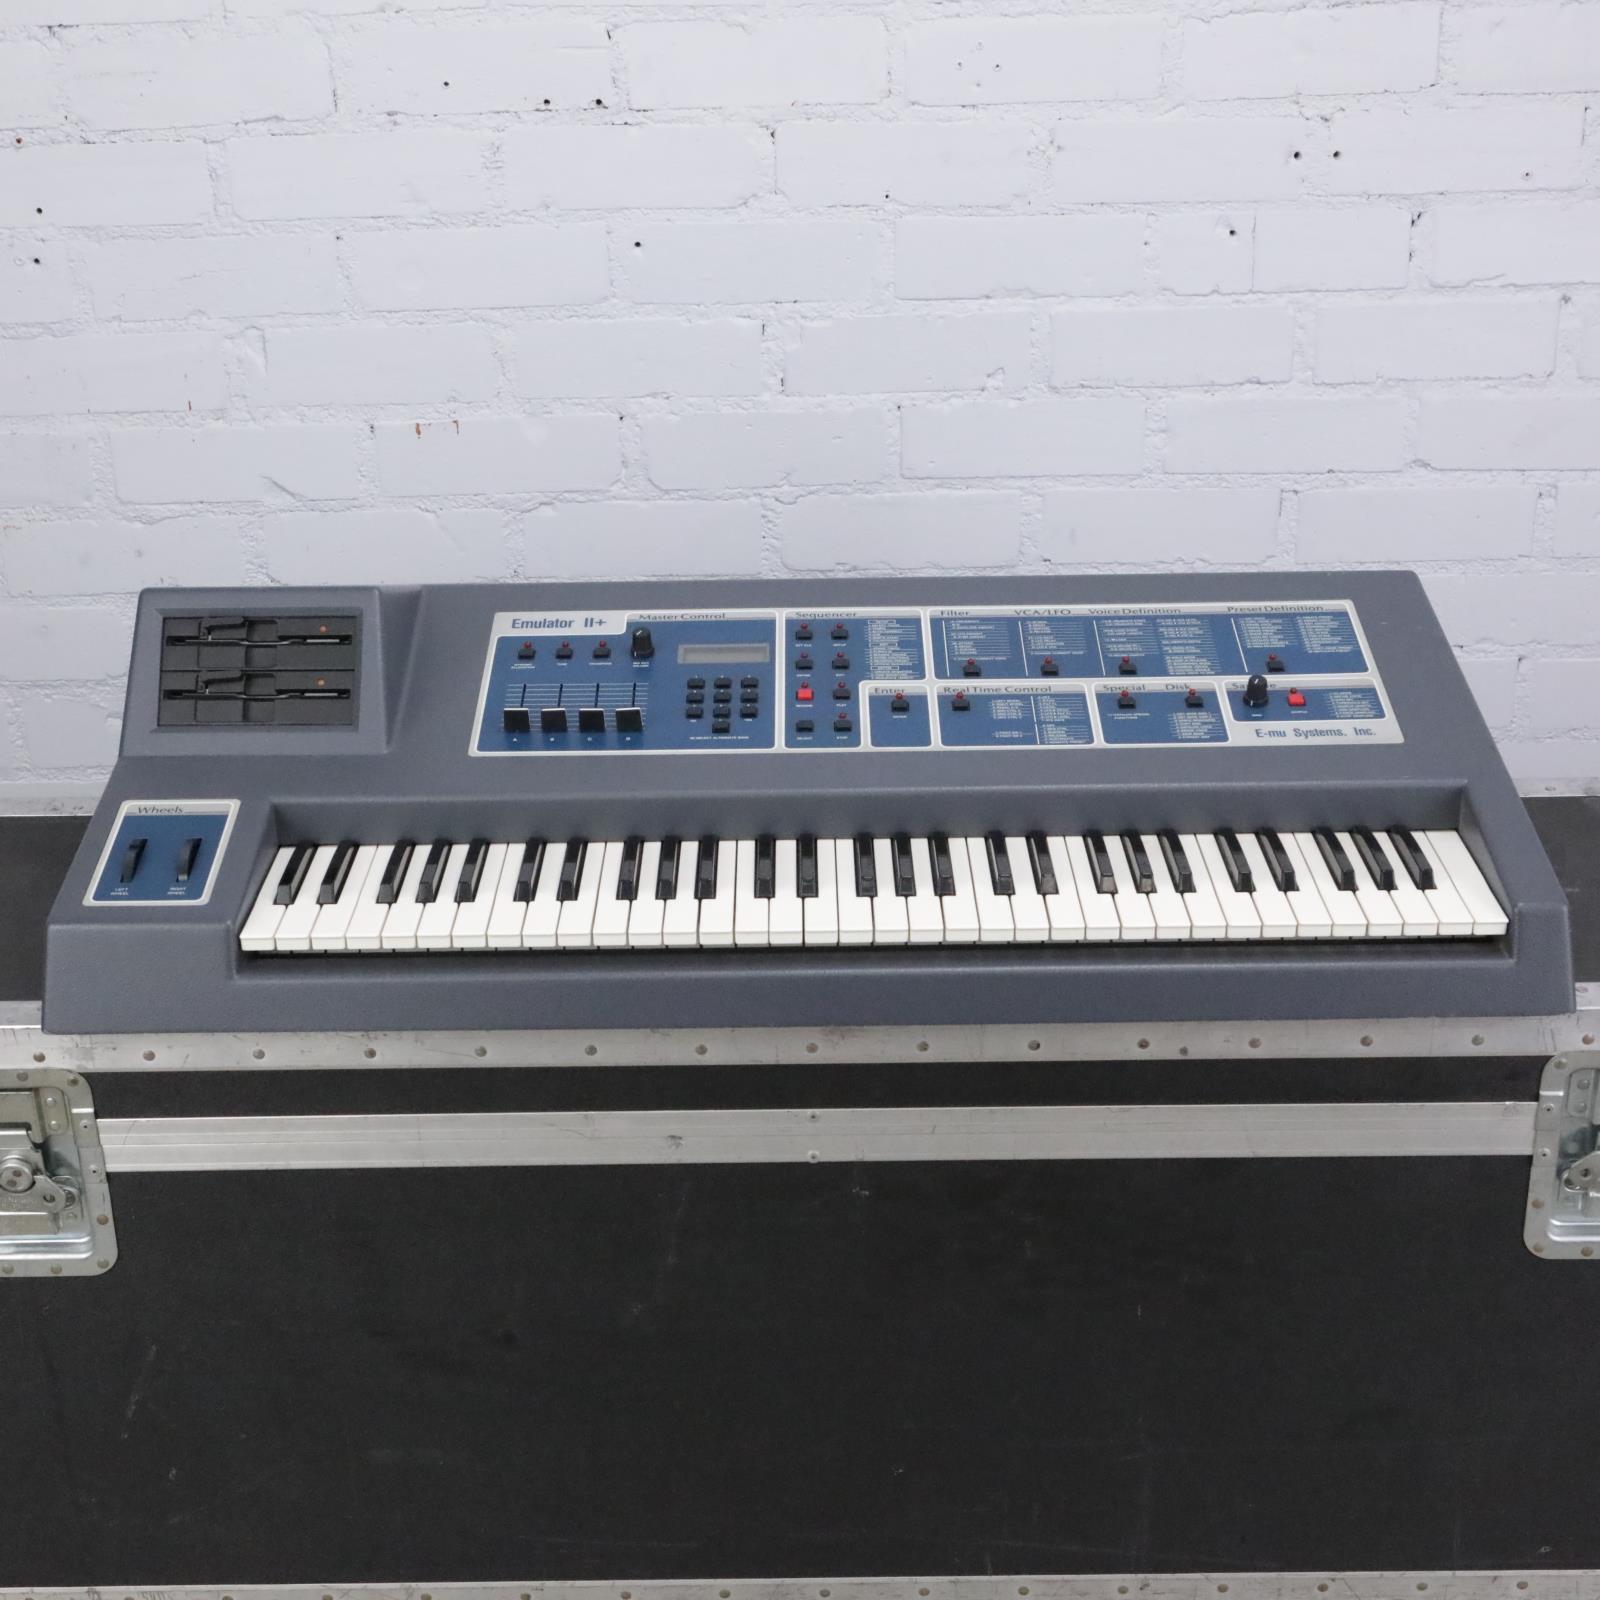 E-mu Emulator II+ Plus Sampler Synthesizer Keyboard #43140